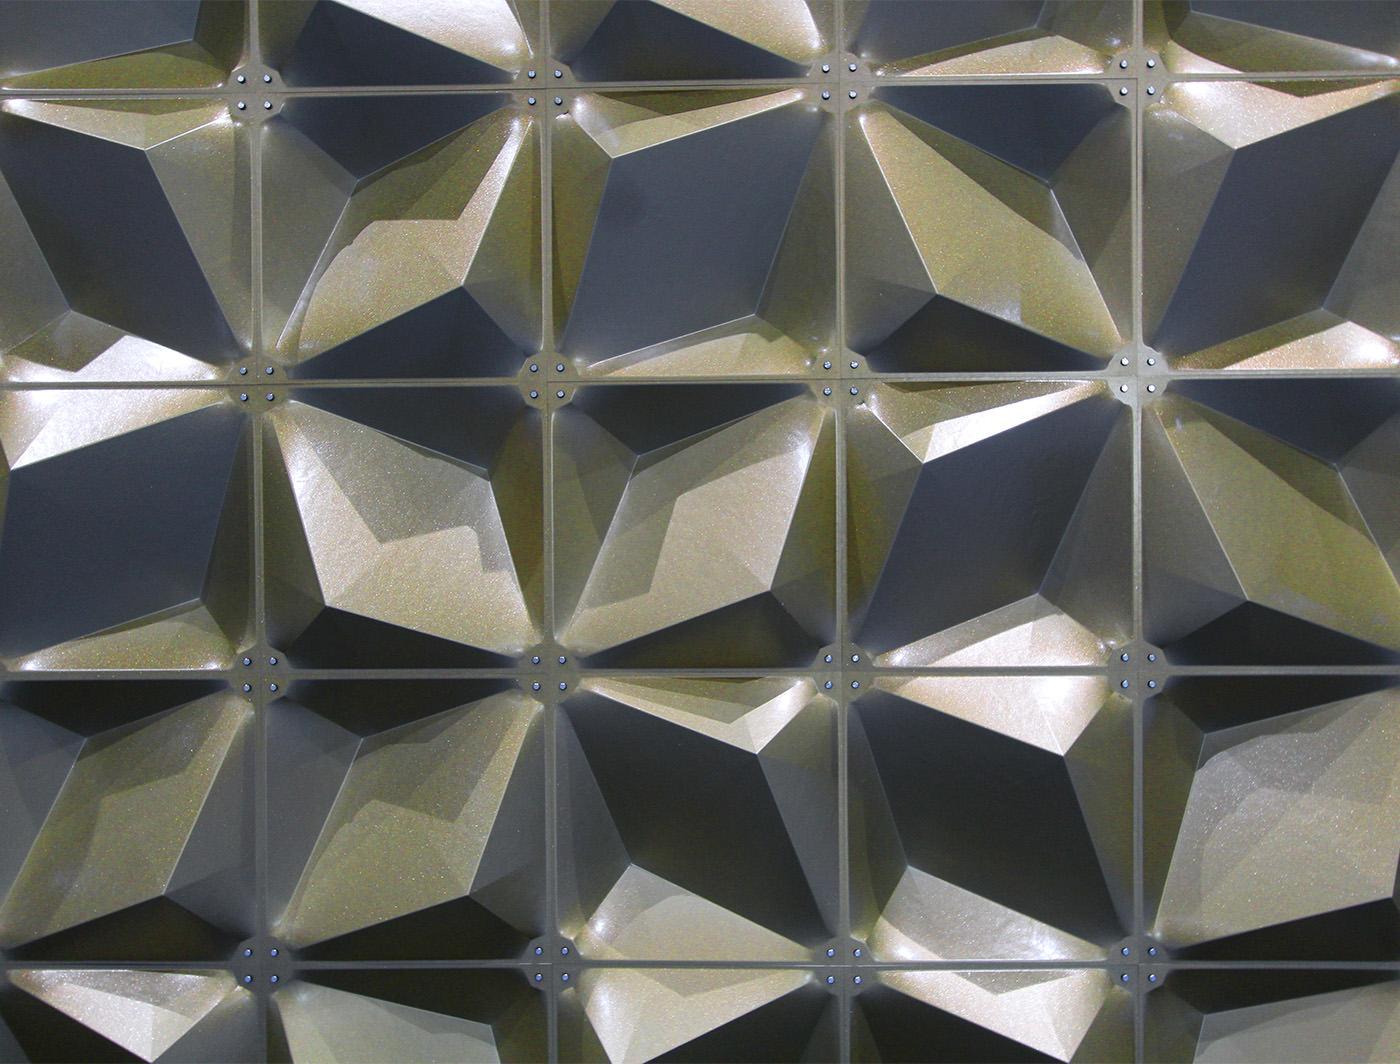 Zeddit Premium gold panels in Natural Light